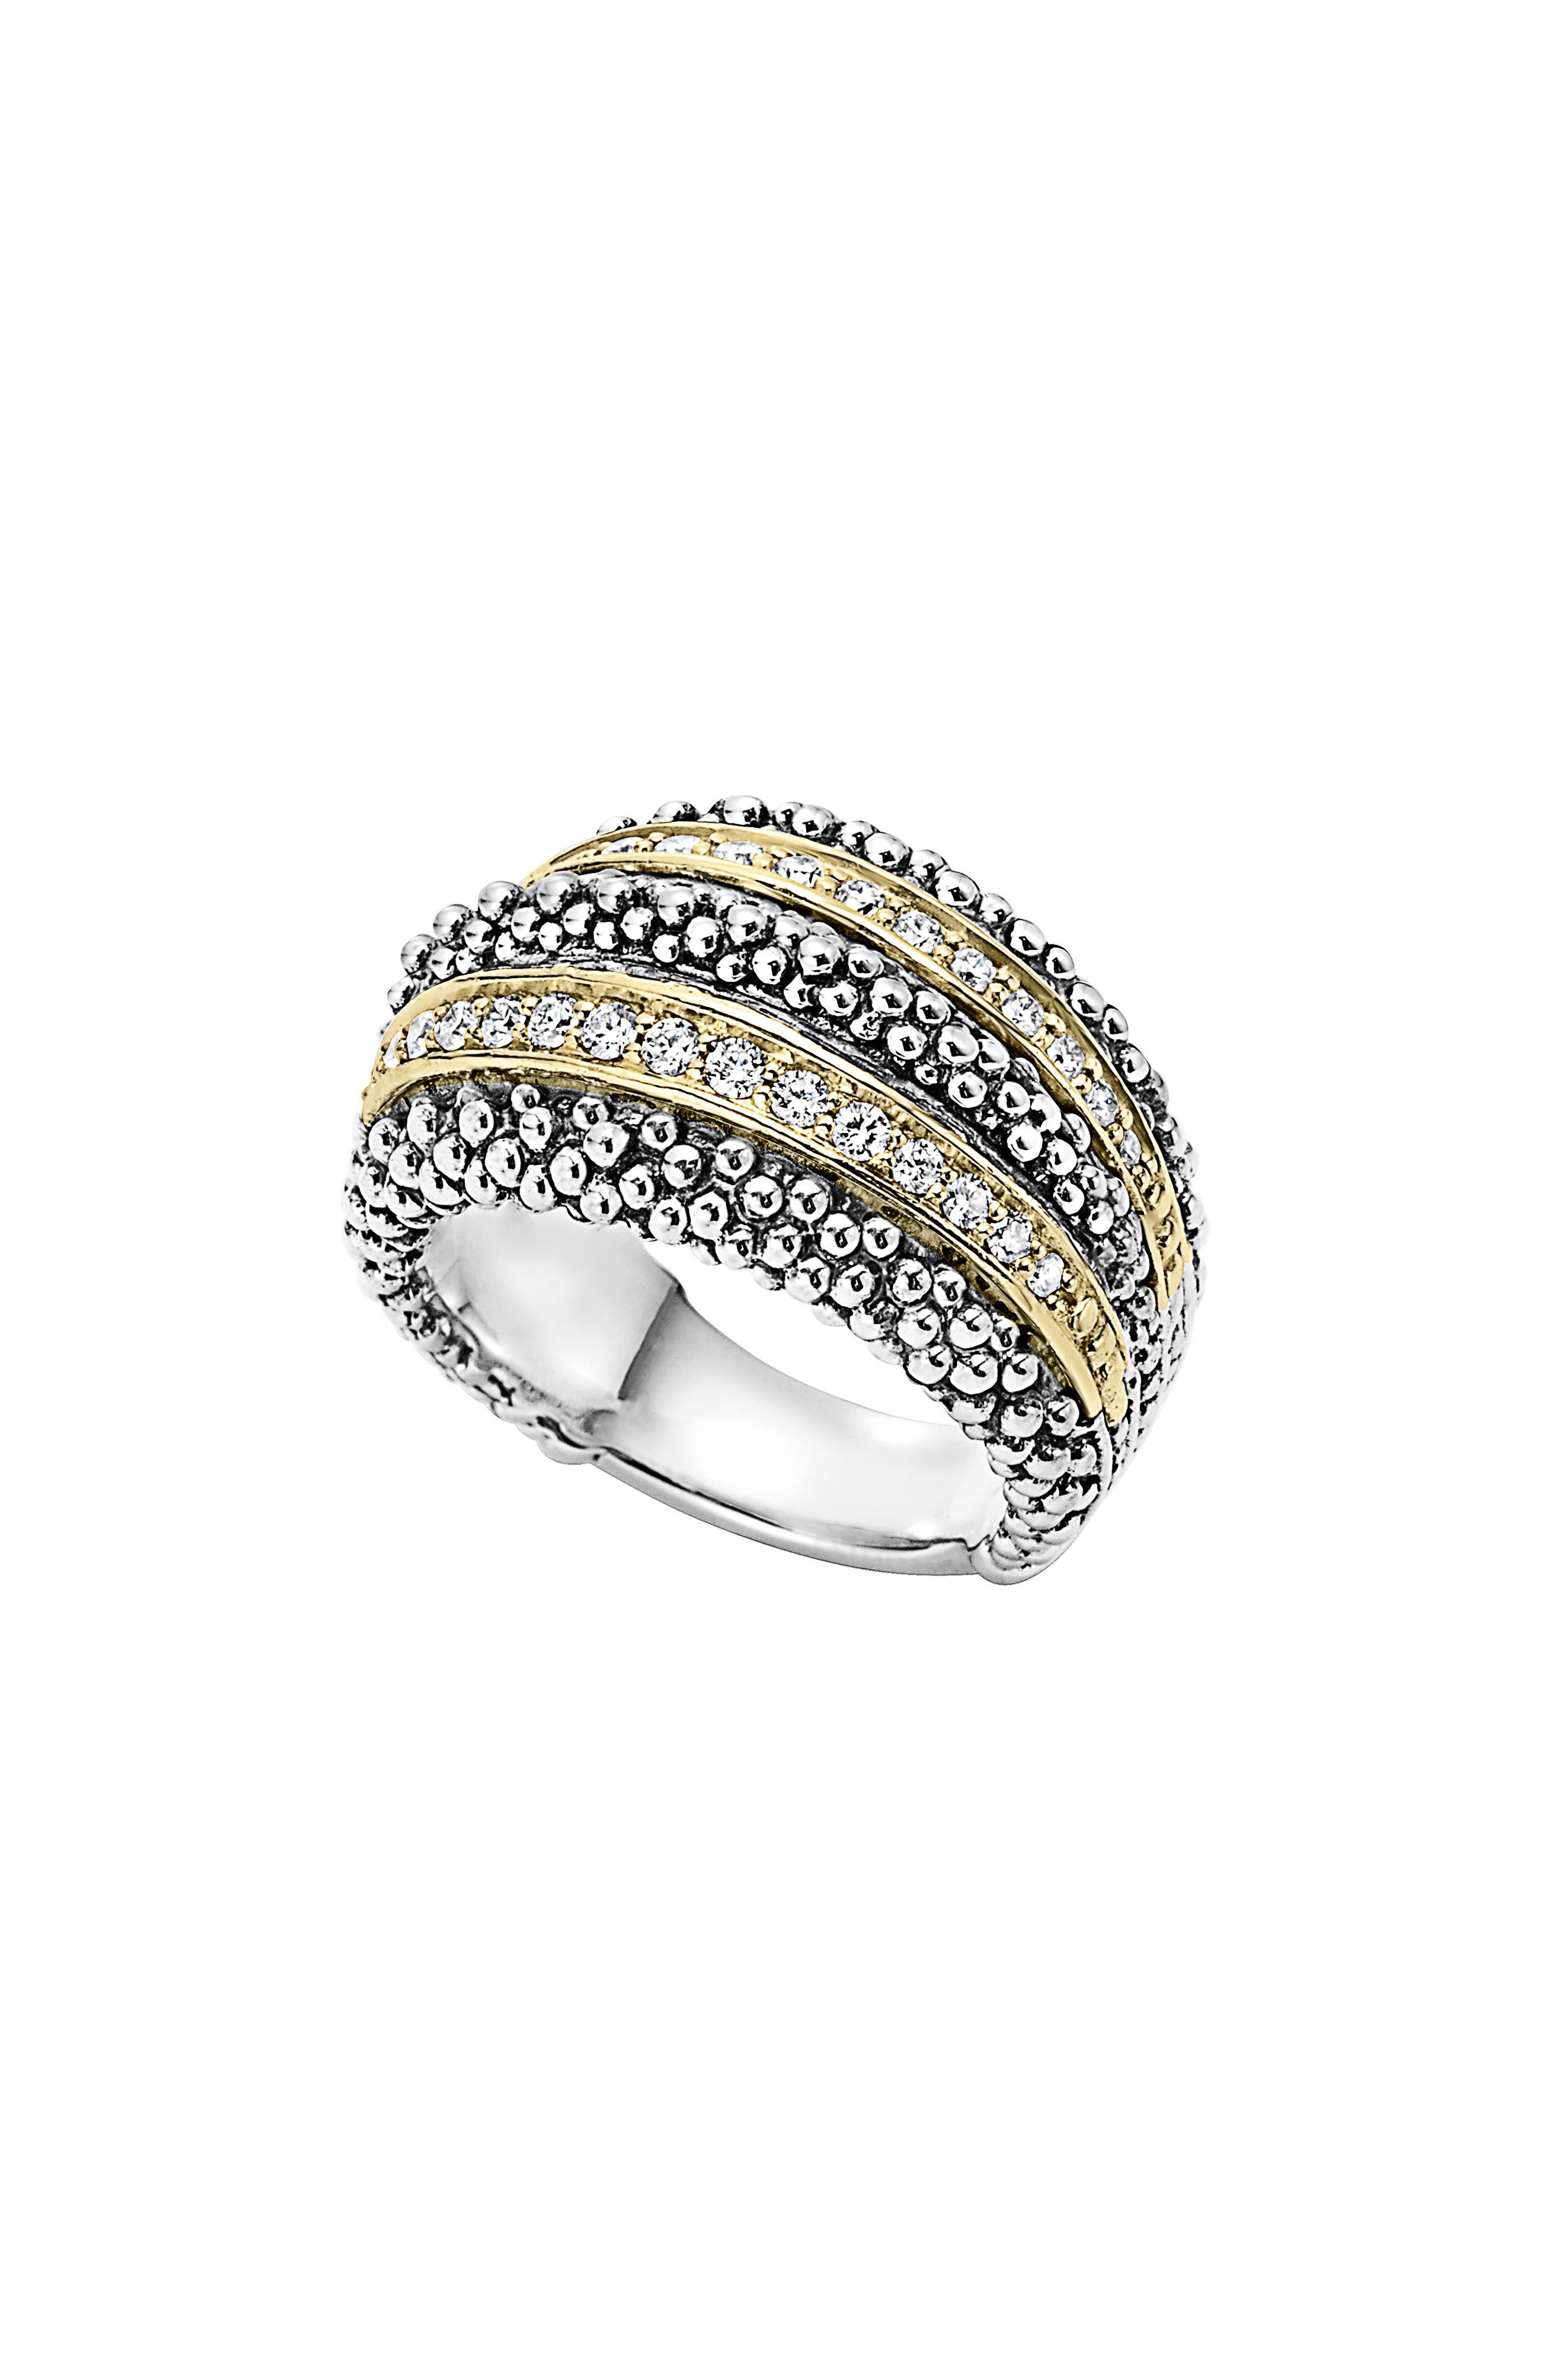 Diamond Caviar Beaded Ring,                             Alternate thumbnail 2, color,                             SILVER/ GOLD